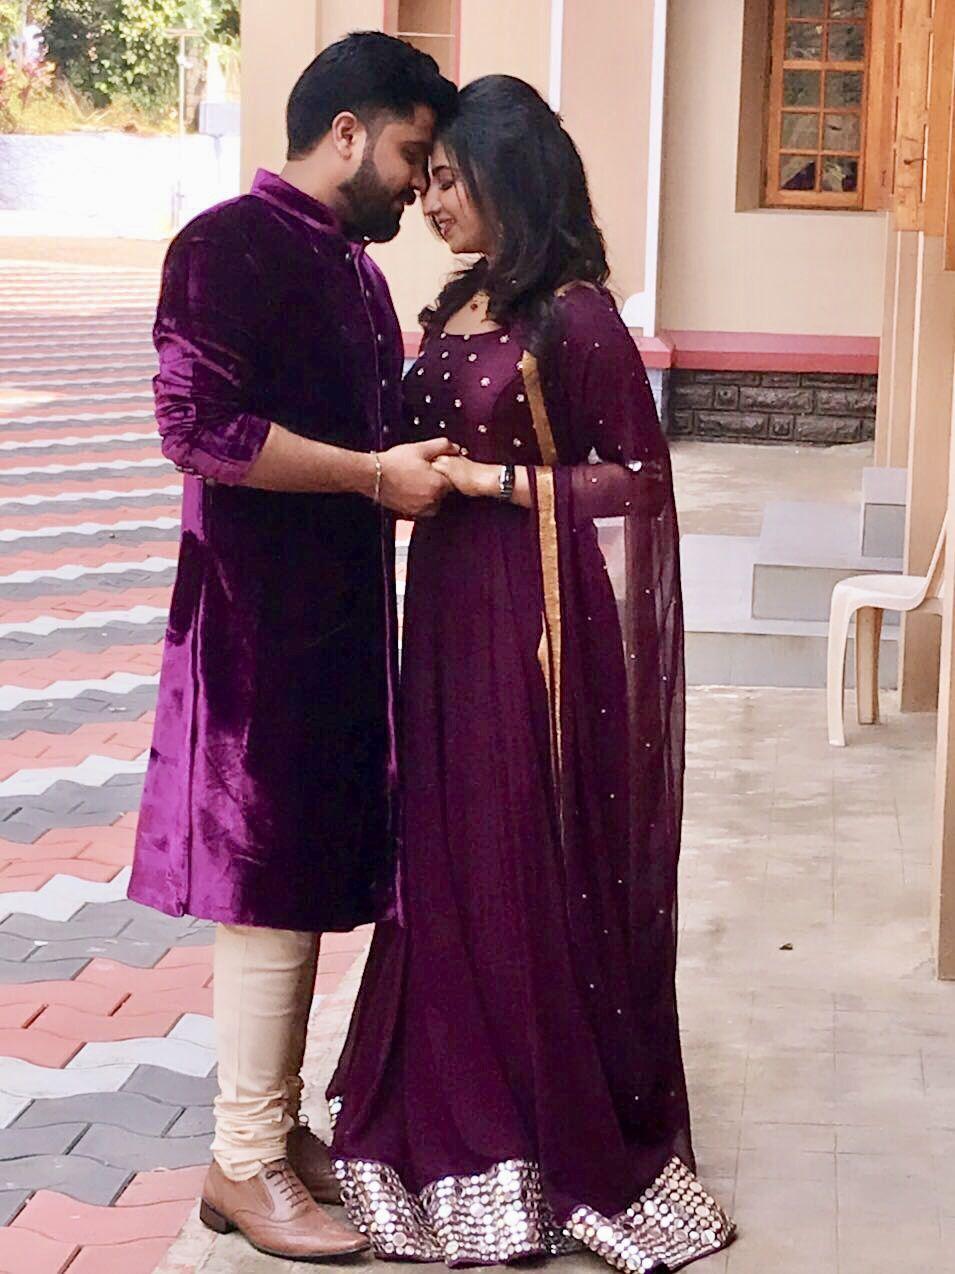 Bride Engagement Design Purple Theme Royalwedding